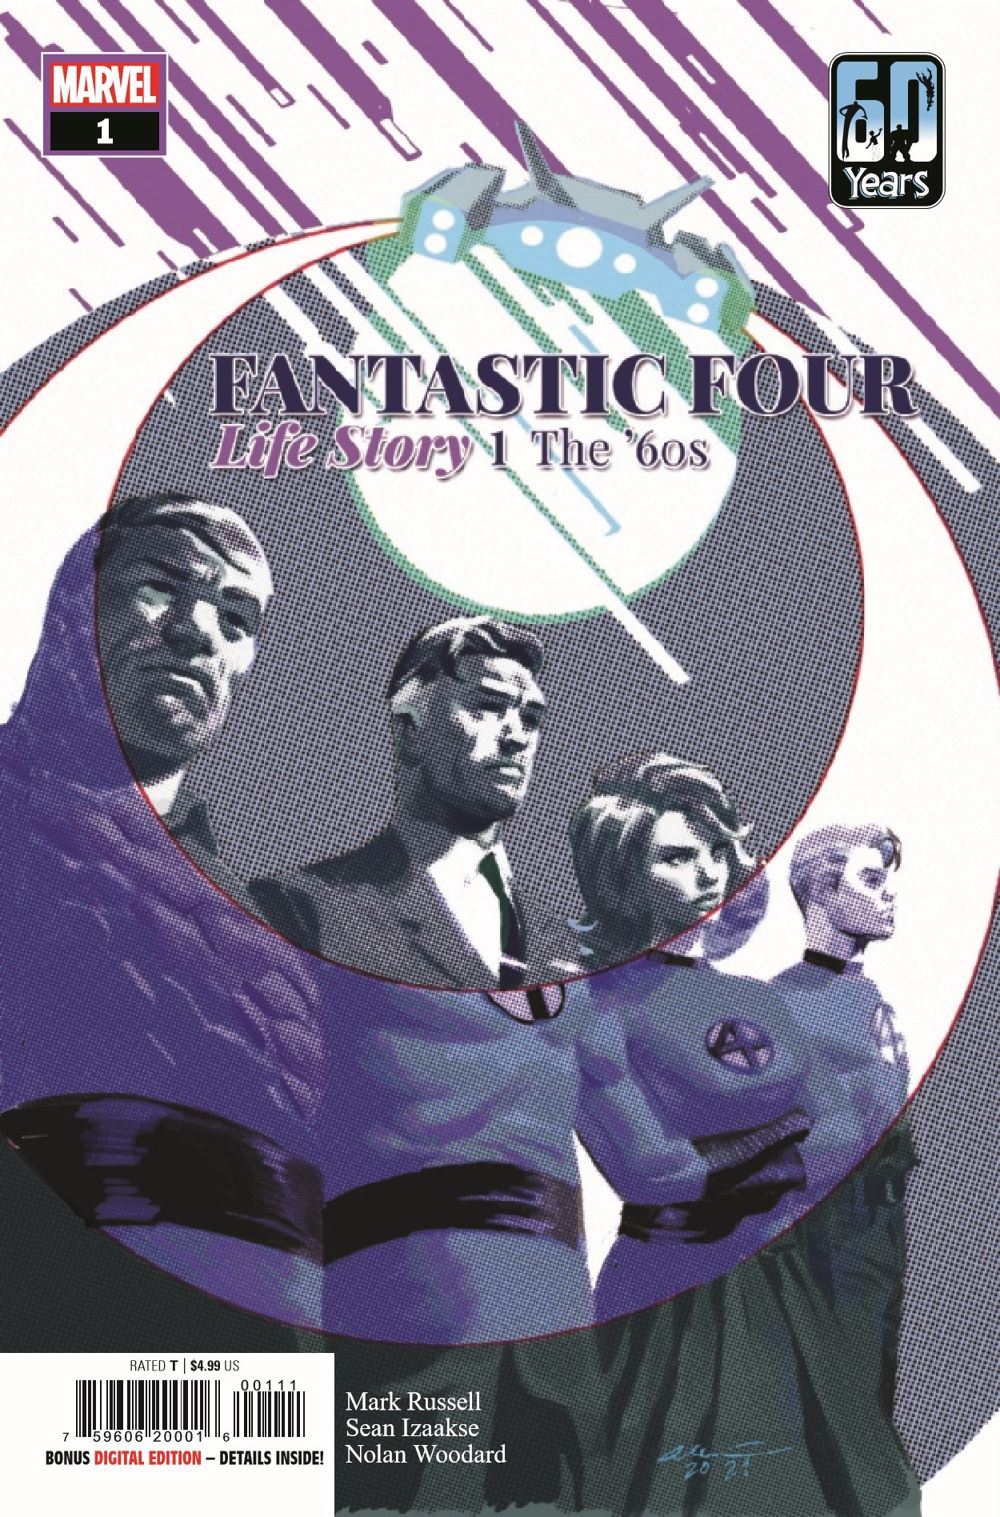 FFLIFESTORY2021001_Preview-1 ComicList Previews: FANTASTIC FOUR LIFE STORY #1 (OF 6)